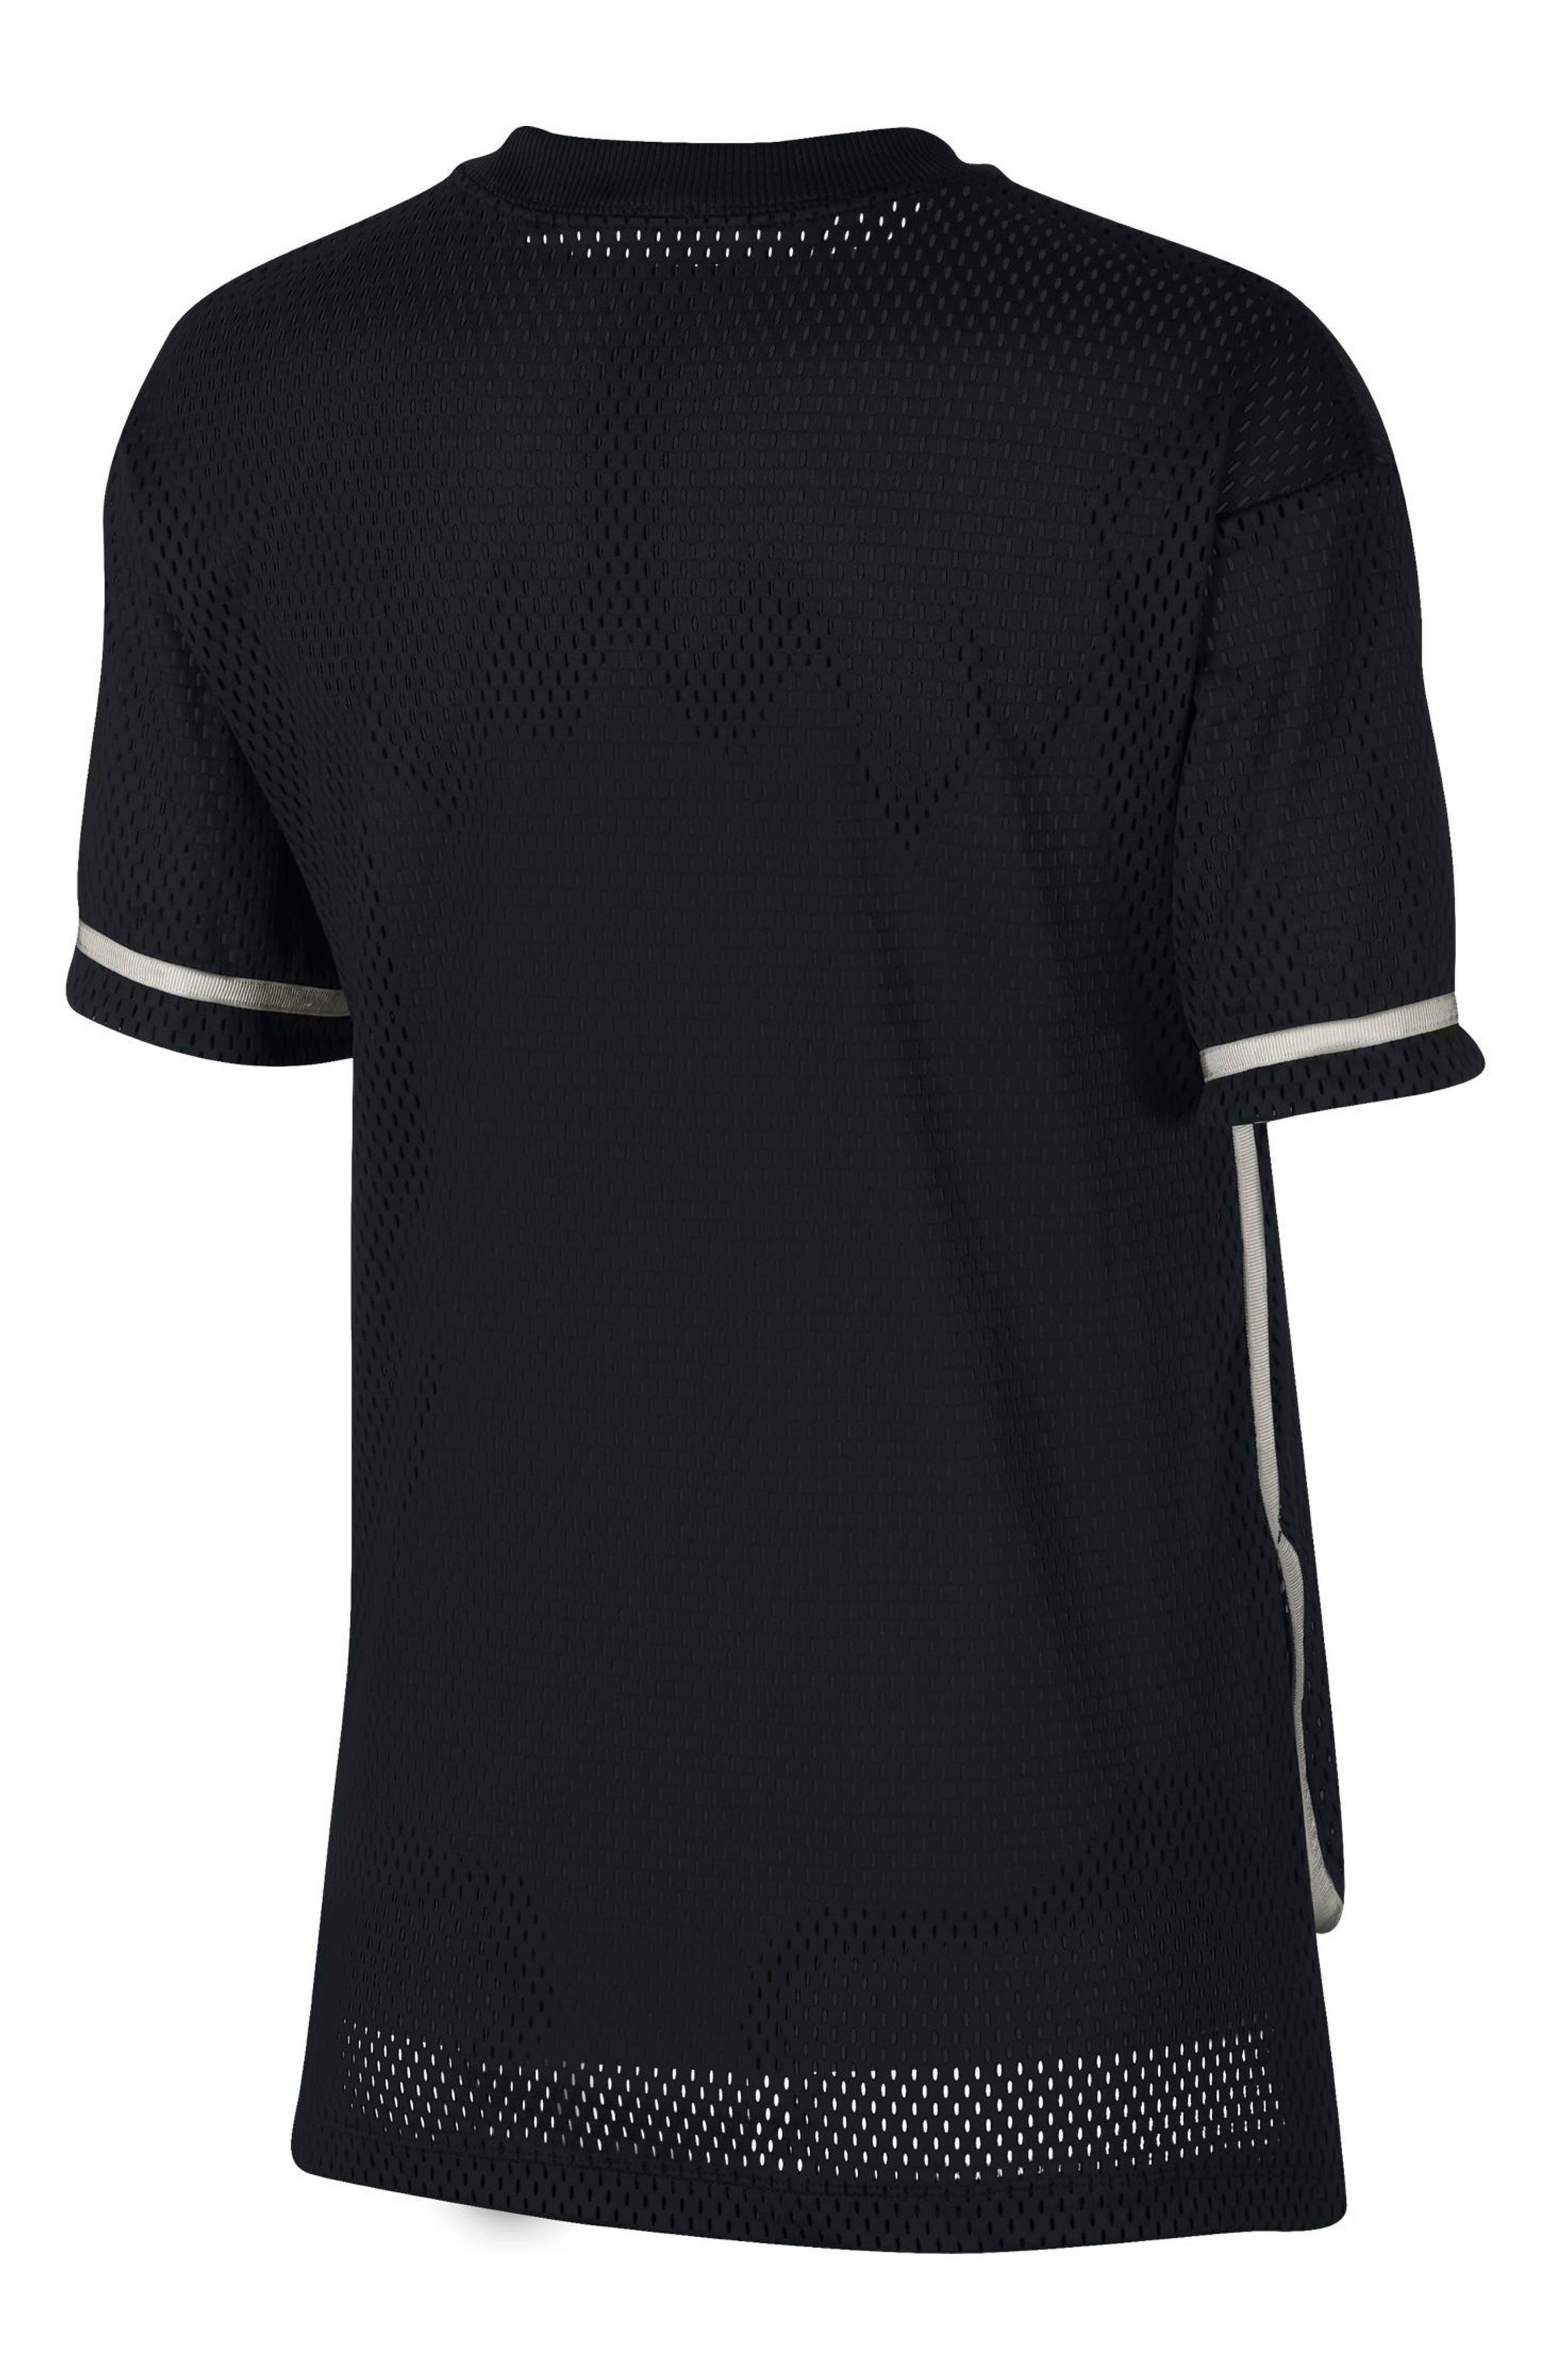 Sportswear Short Sleeve Dri-FIT Mesh Tee,                             Alternate thumbnail 2, color,                             010